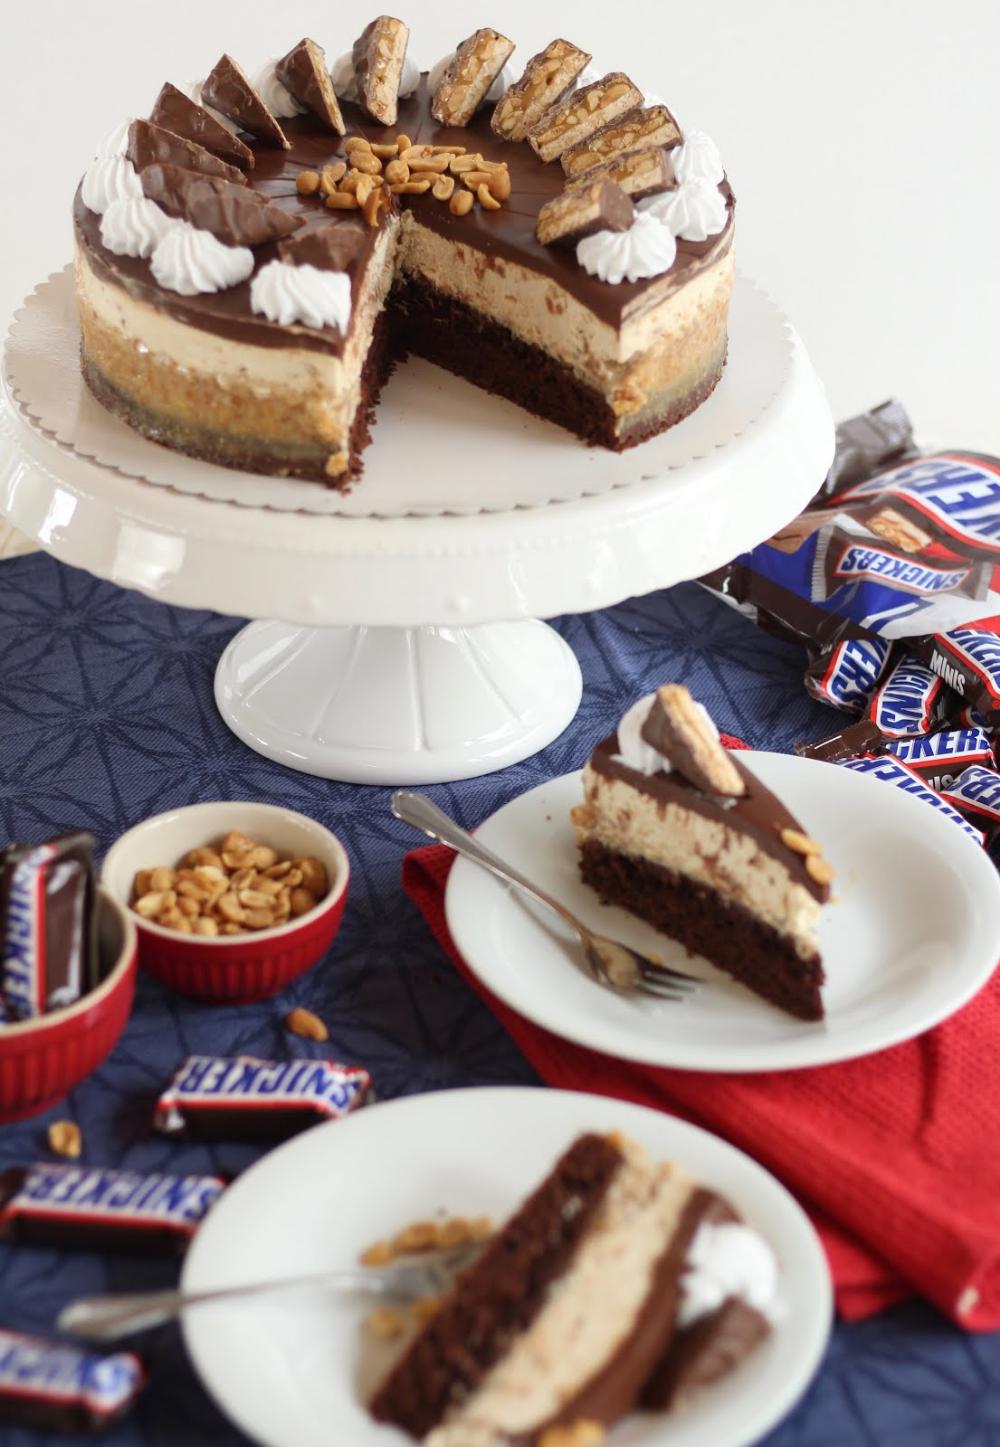 Mega Leckere Snickers Torte Erdnuss Karamell Schoko Torte Rezept In 2020 Kuchen Und Torten Rezepte Lecker Torten Rezepte